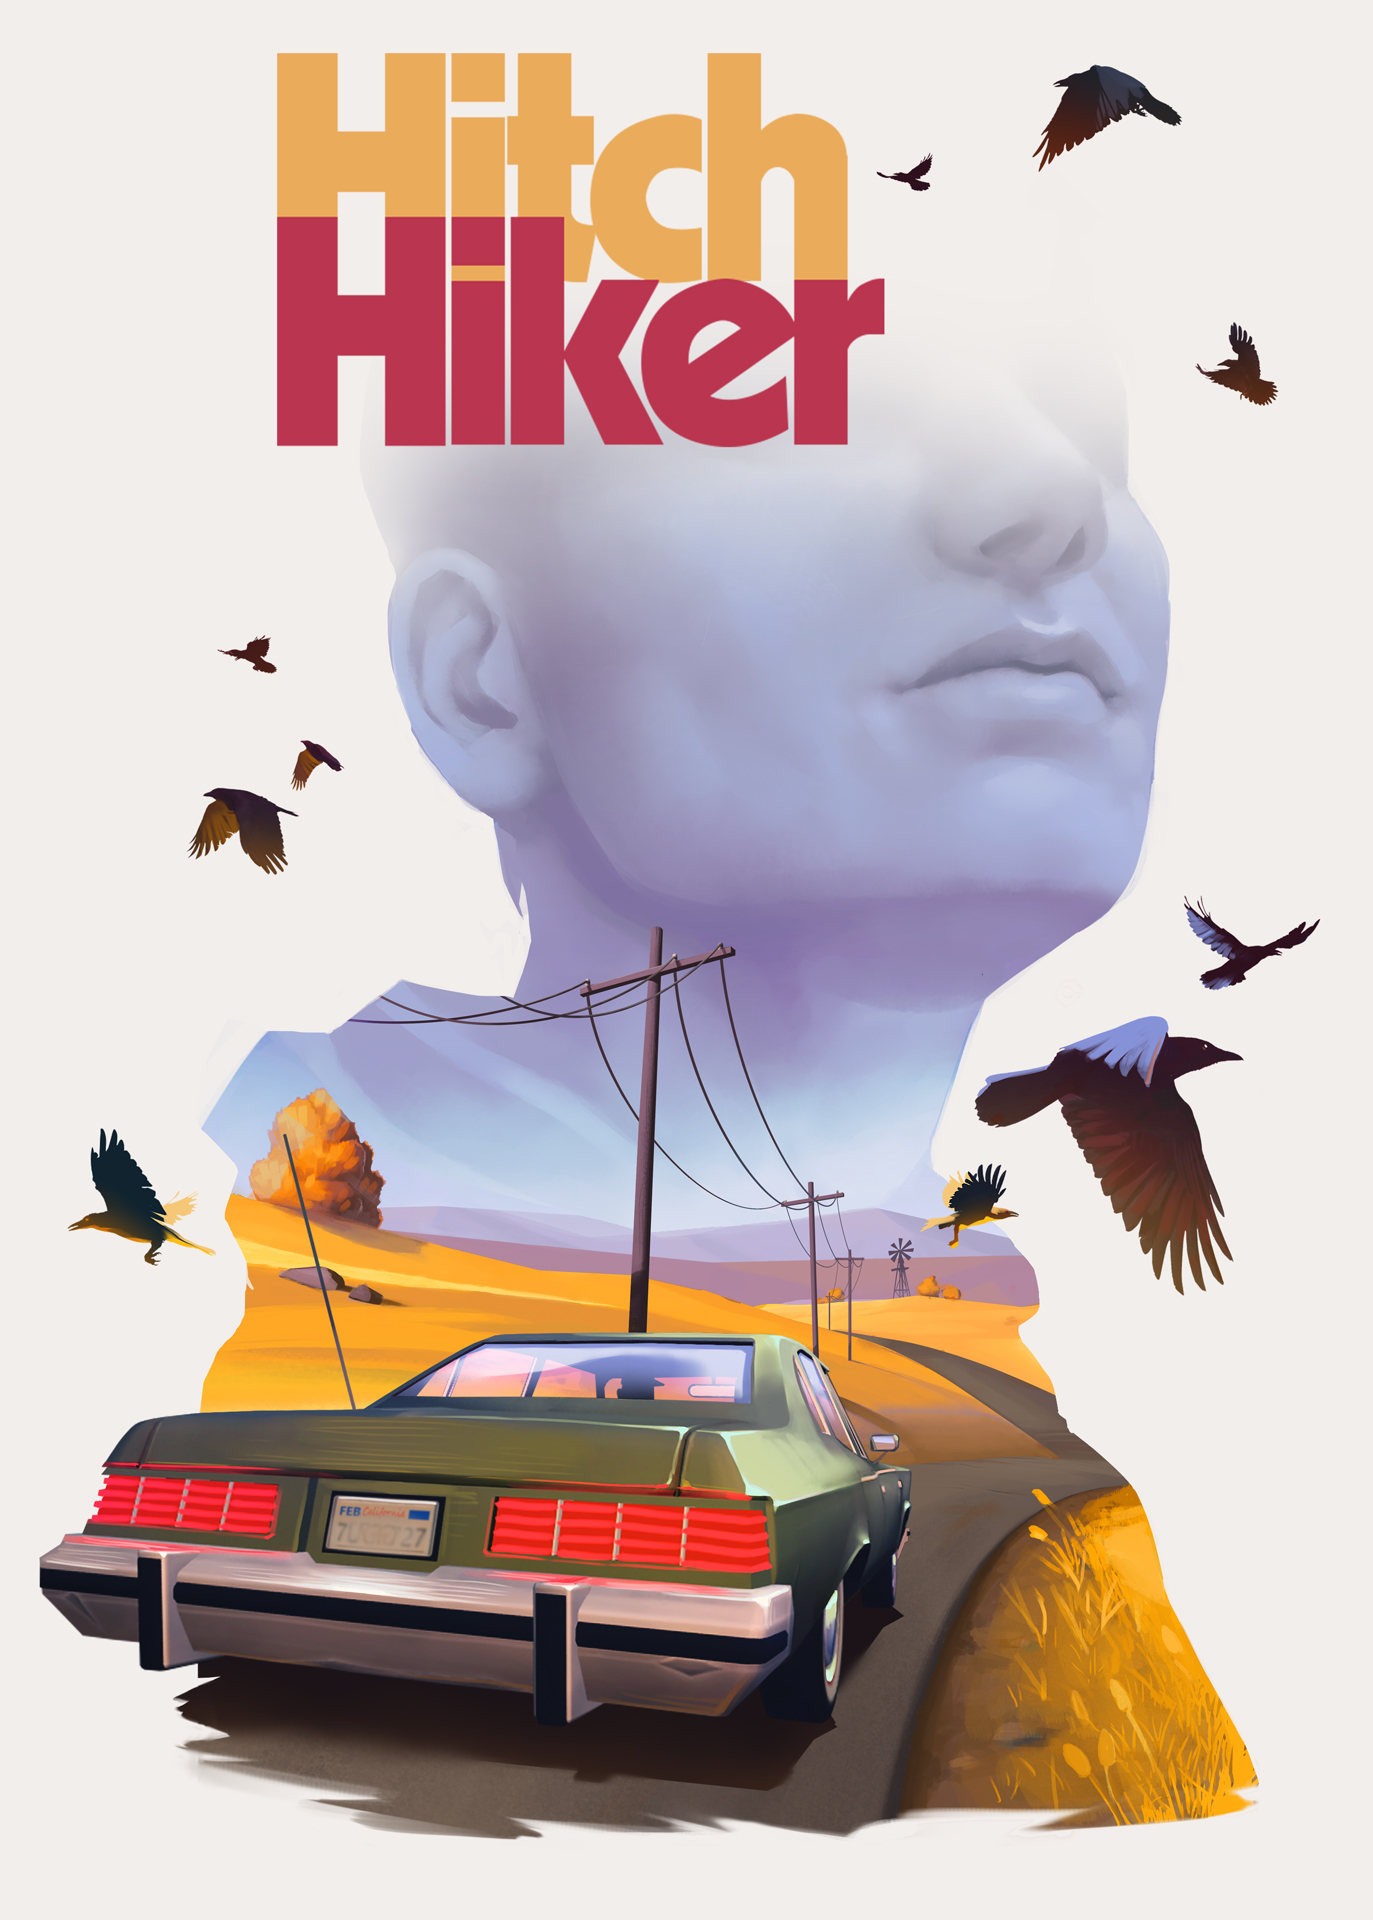 HitchHiker-KeyArt-20191115-portrait